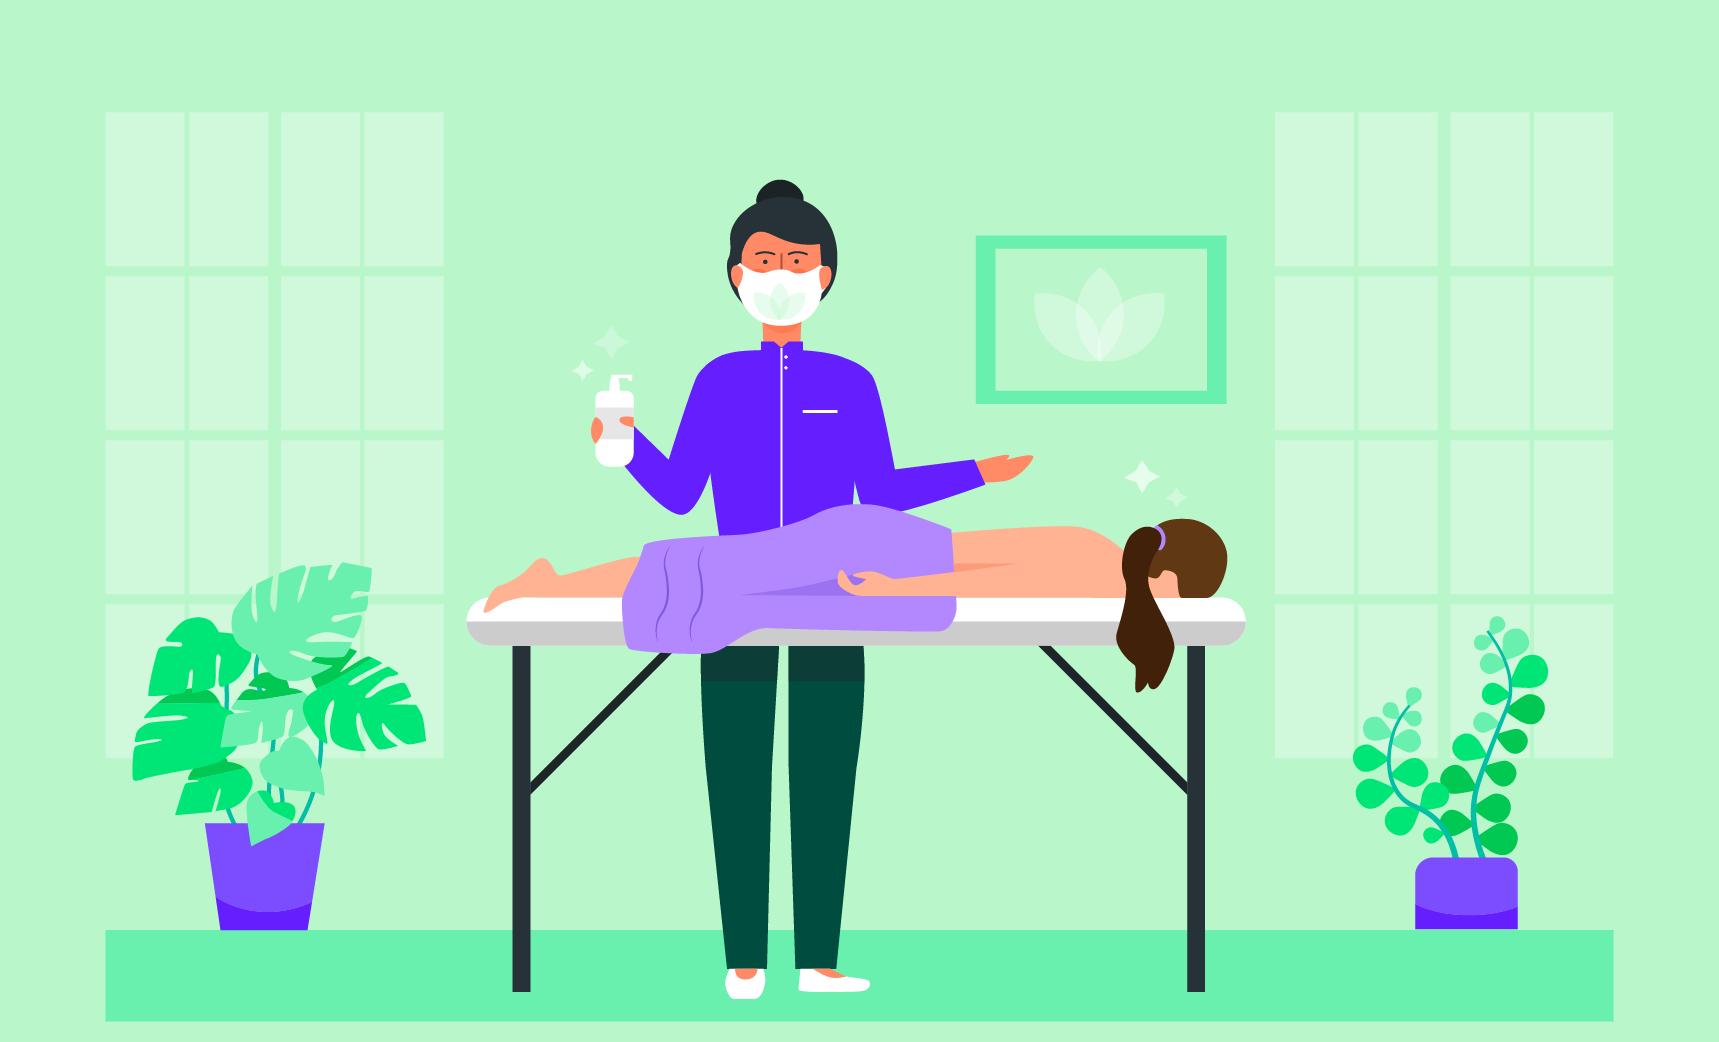 massage therapist repoen their business